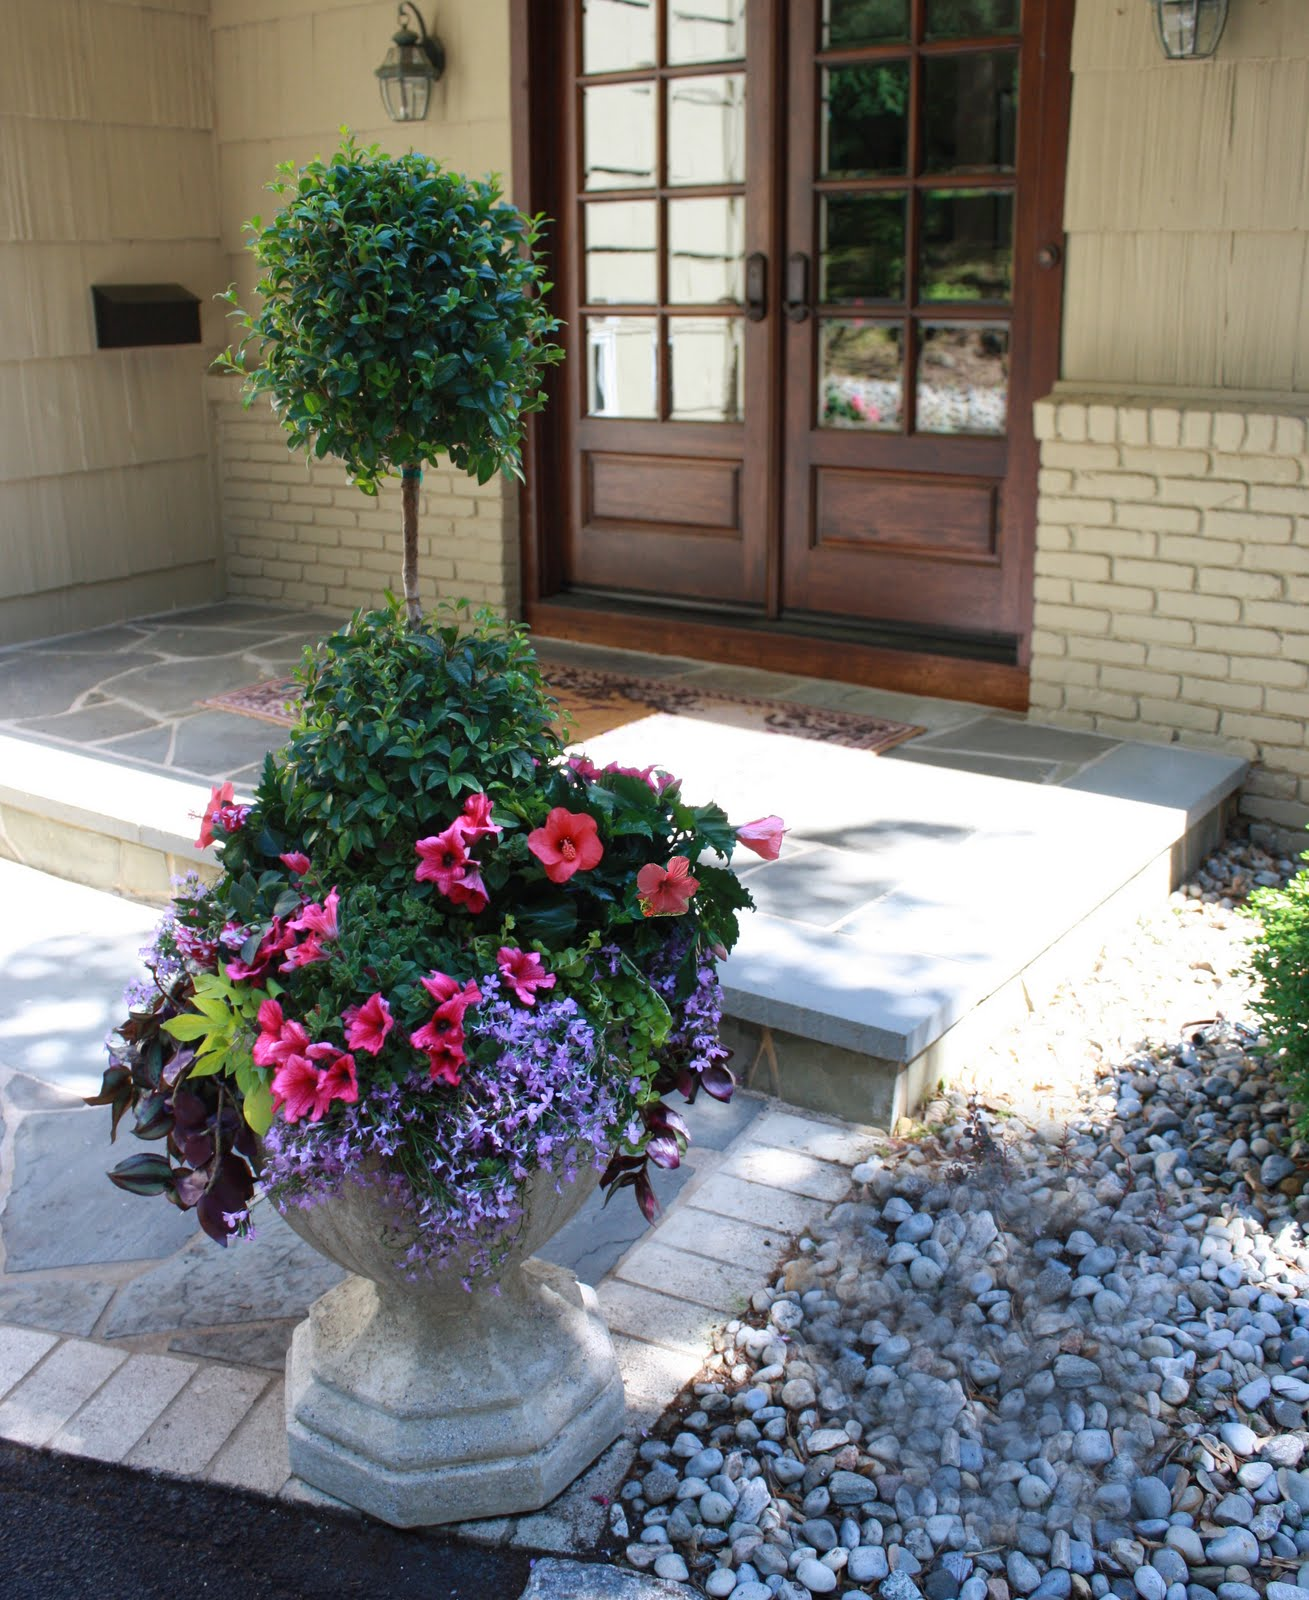 flores del sol: eugenia topiary container garden